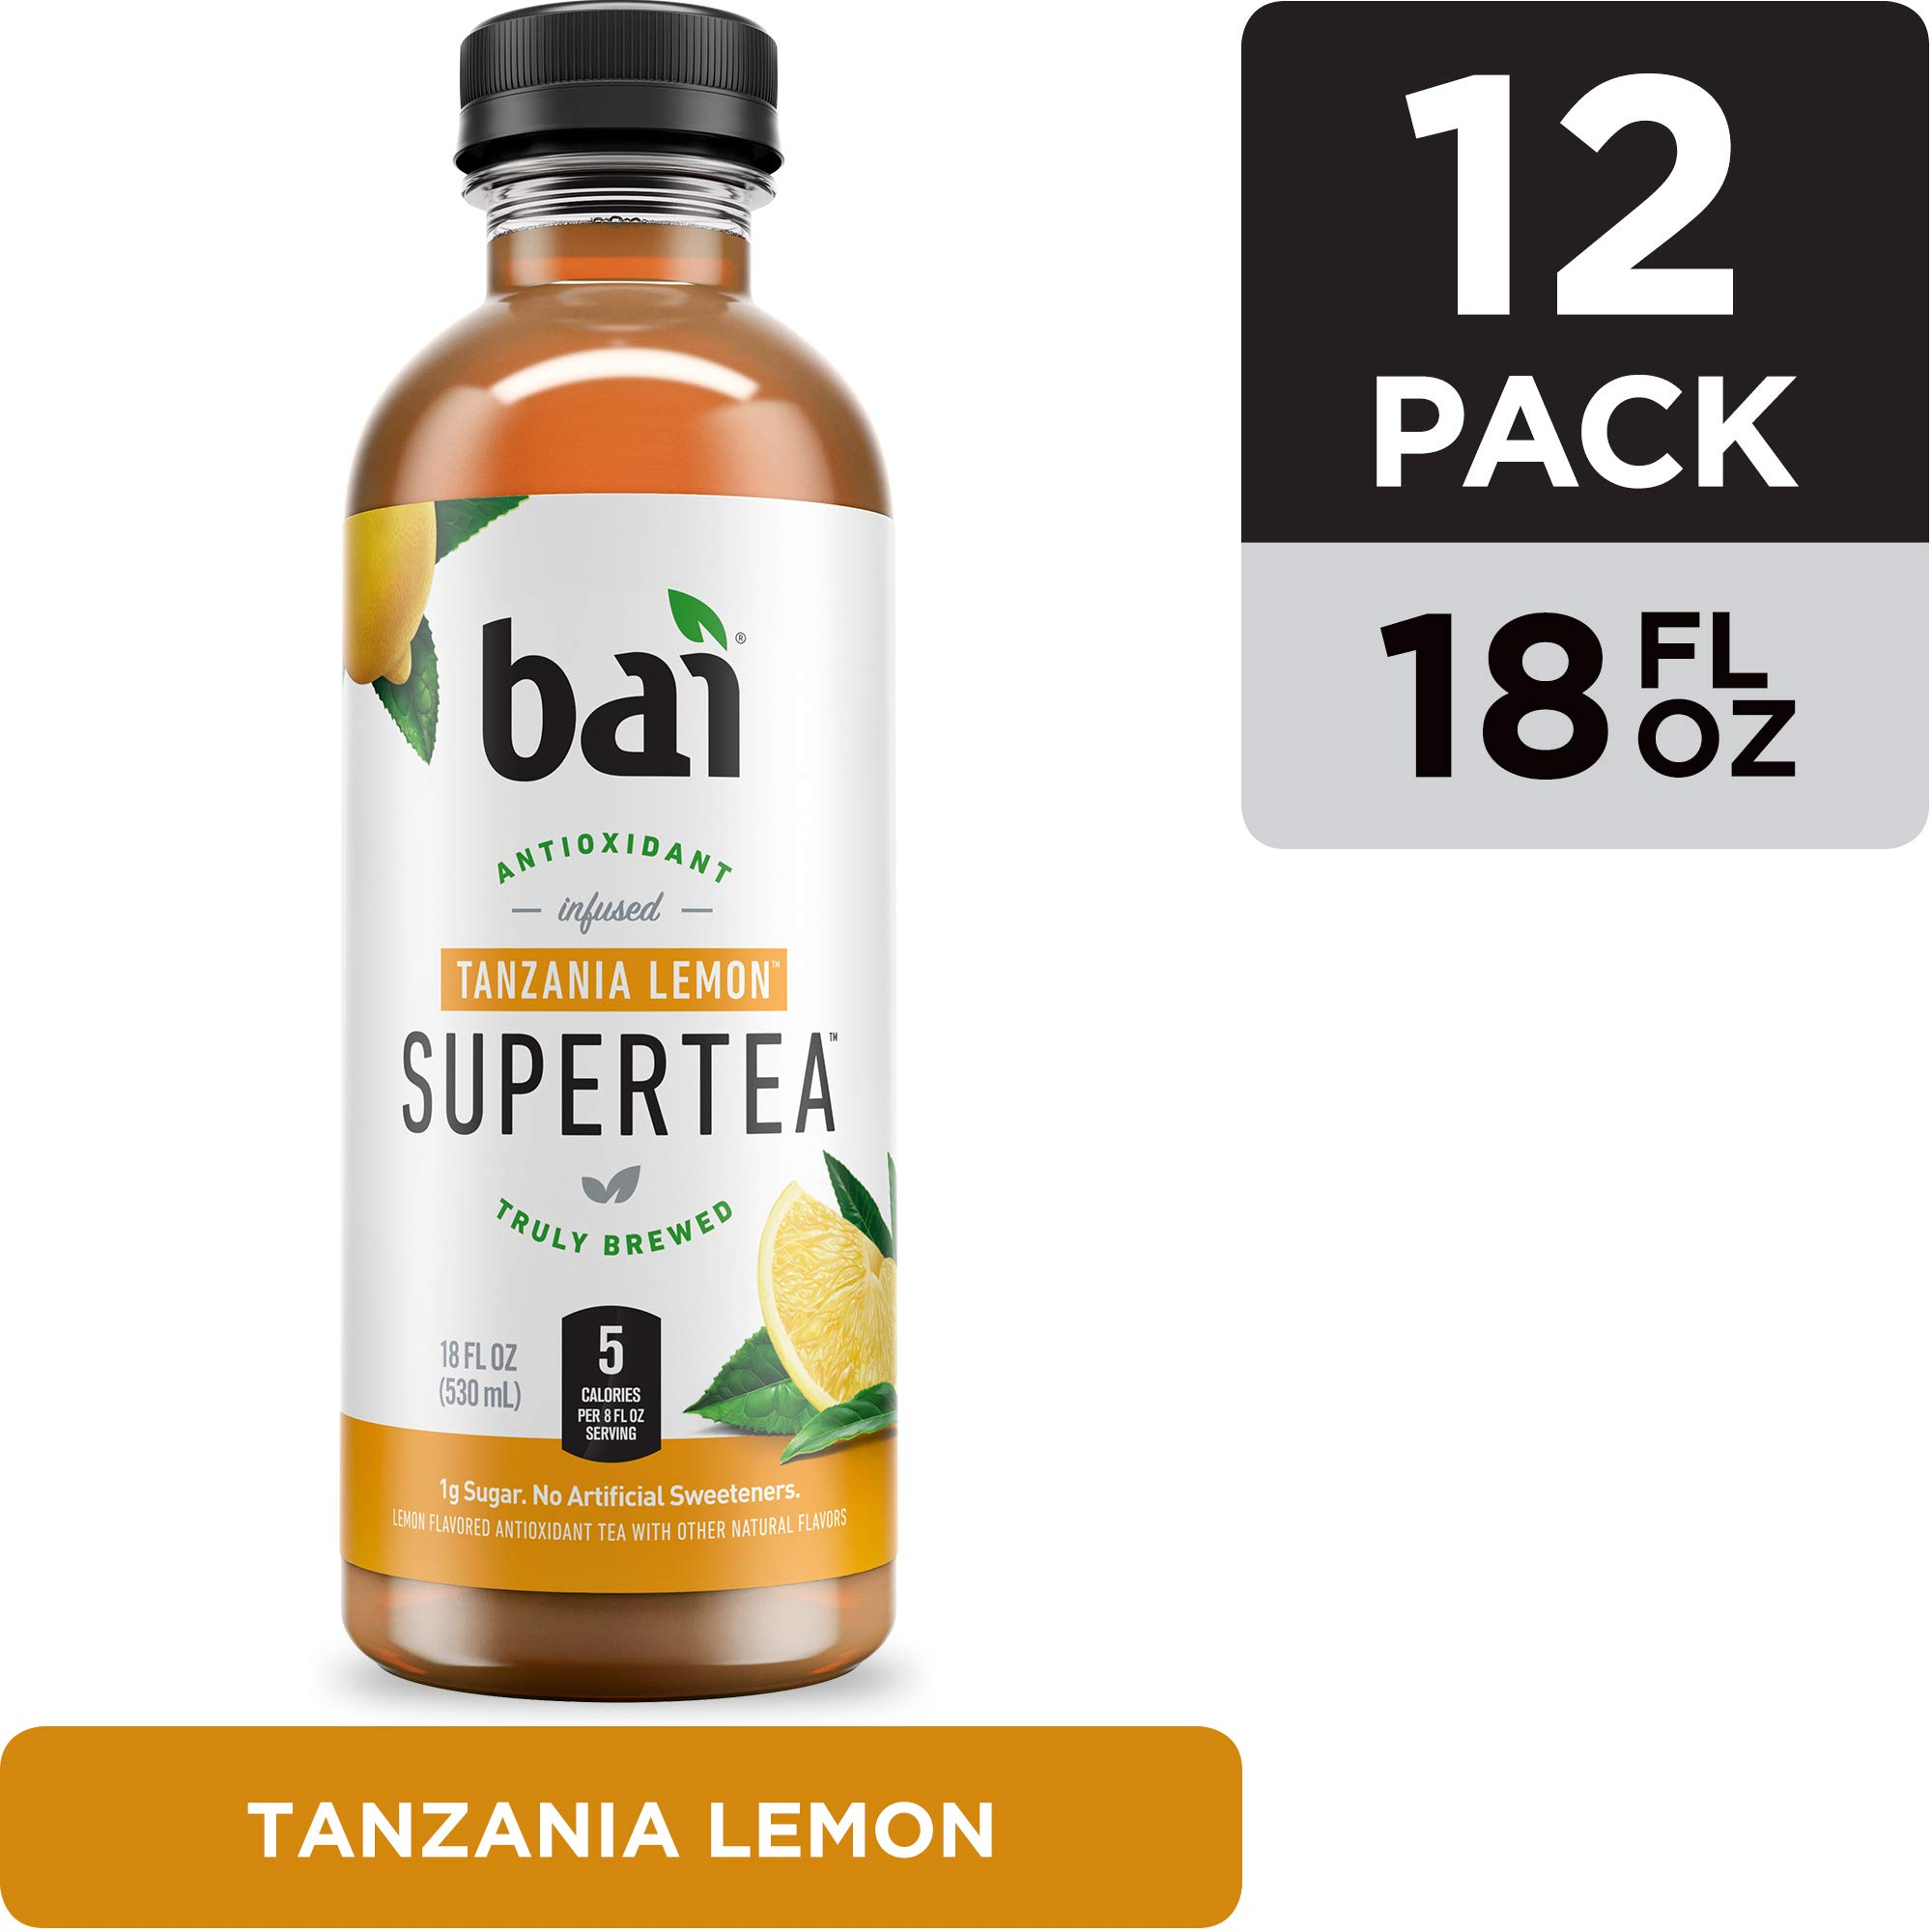 Bai Iced Tea, Tanzania Lemon, Antioxidant Infused Supertea, Crafted with Real Tea (Black Tea, White Tea), 18 Fluid Ounce Bottles, 12 count by Bai